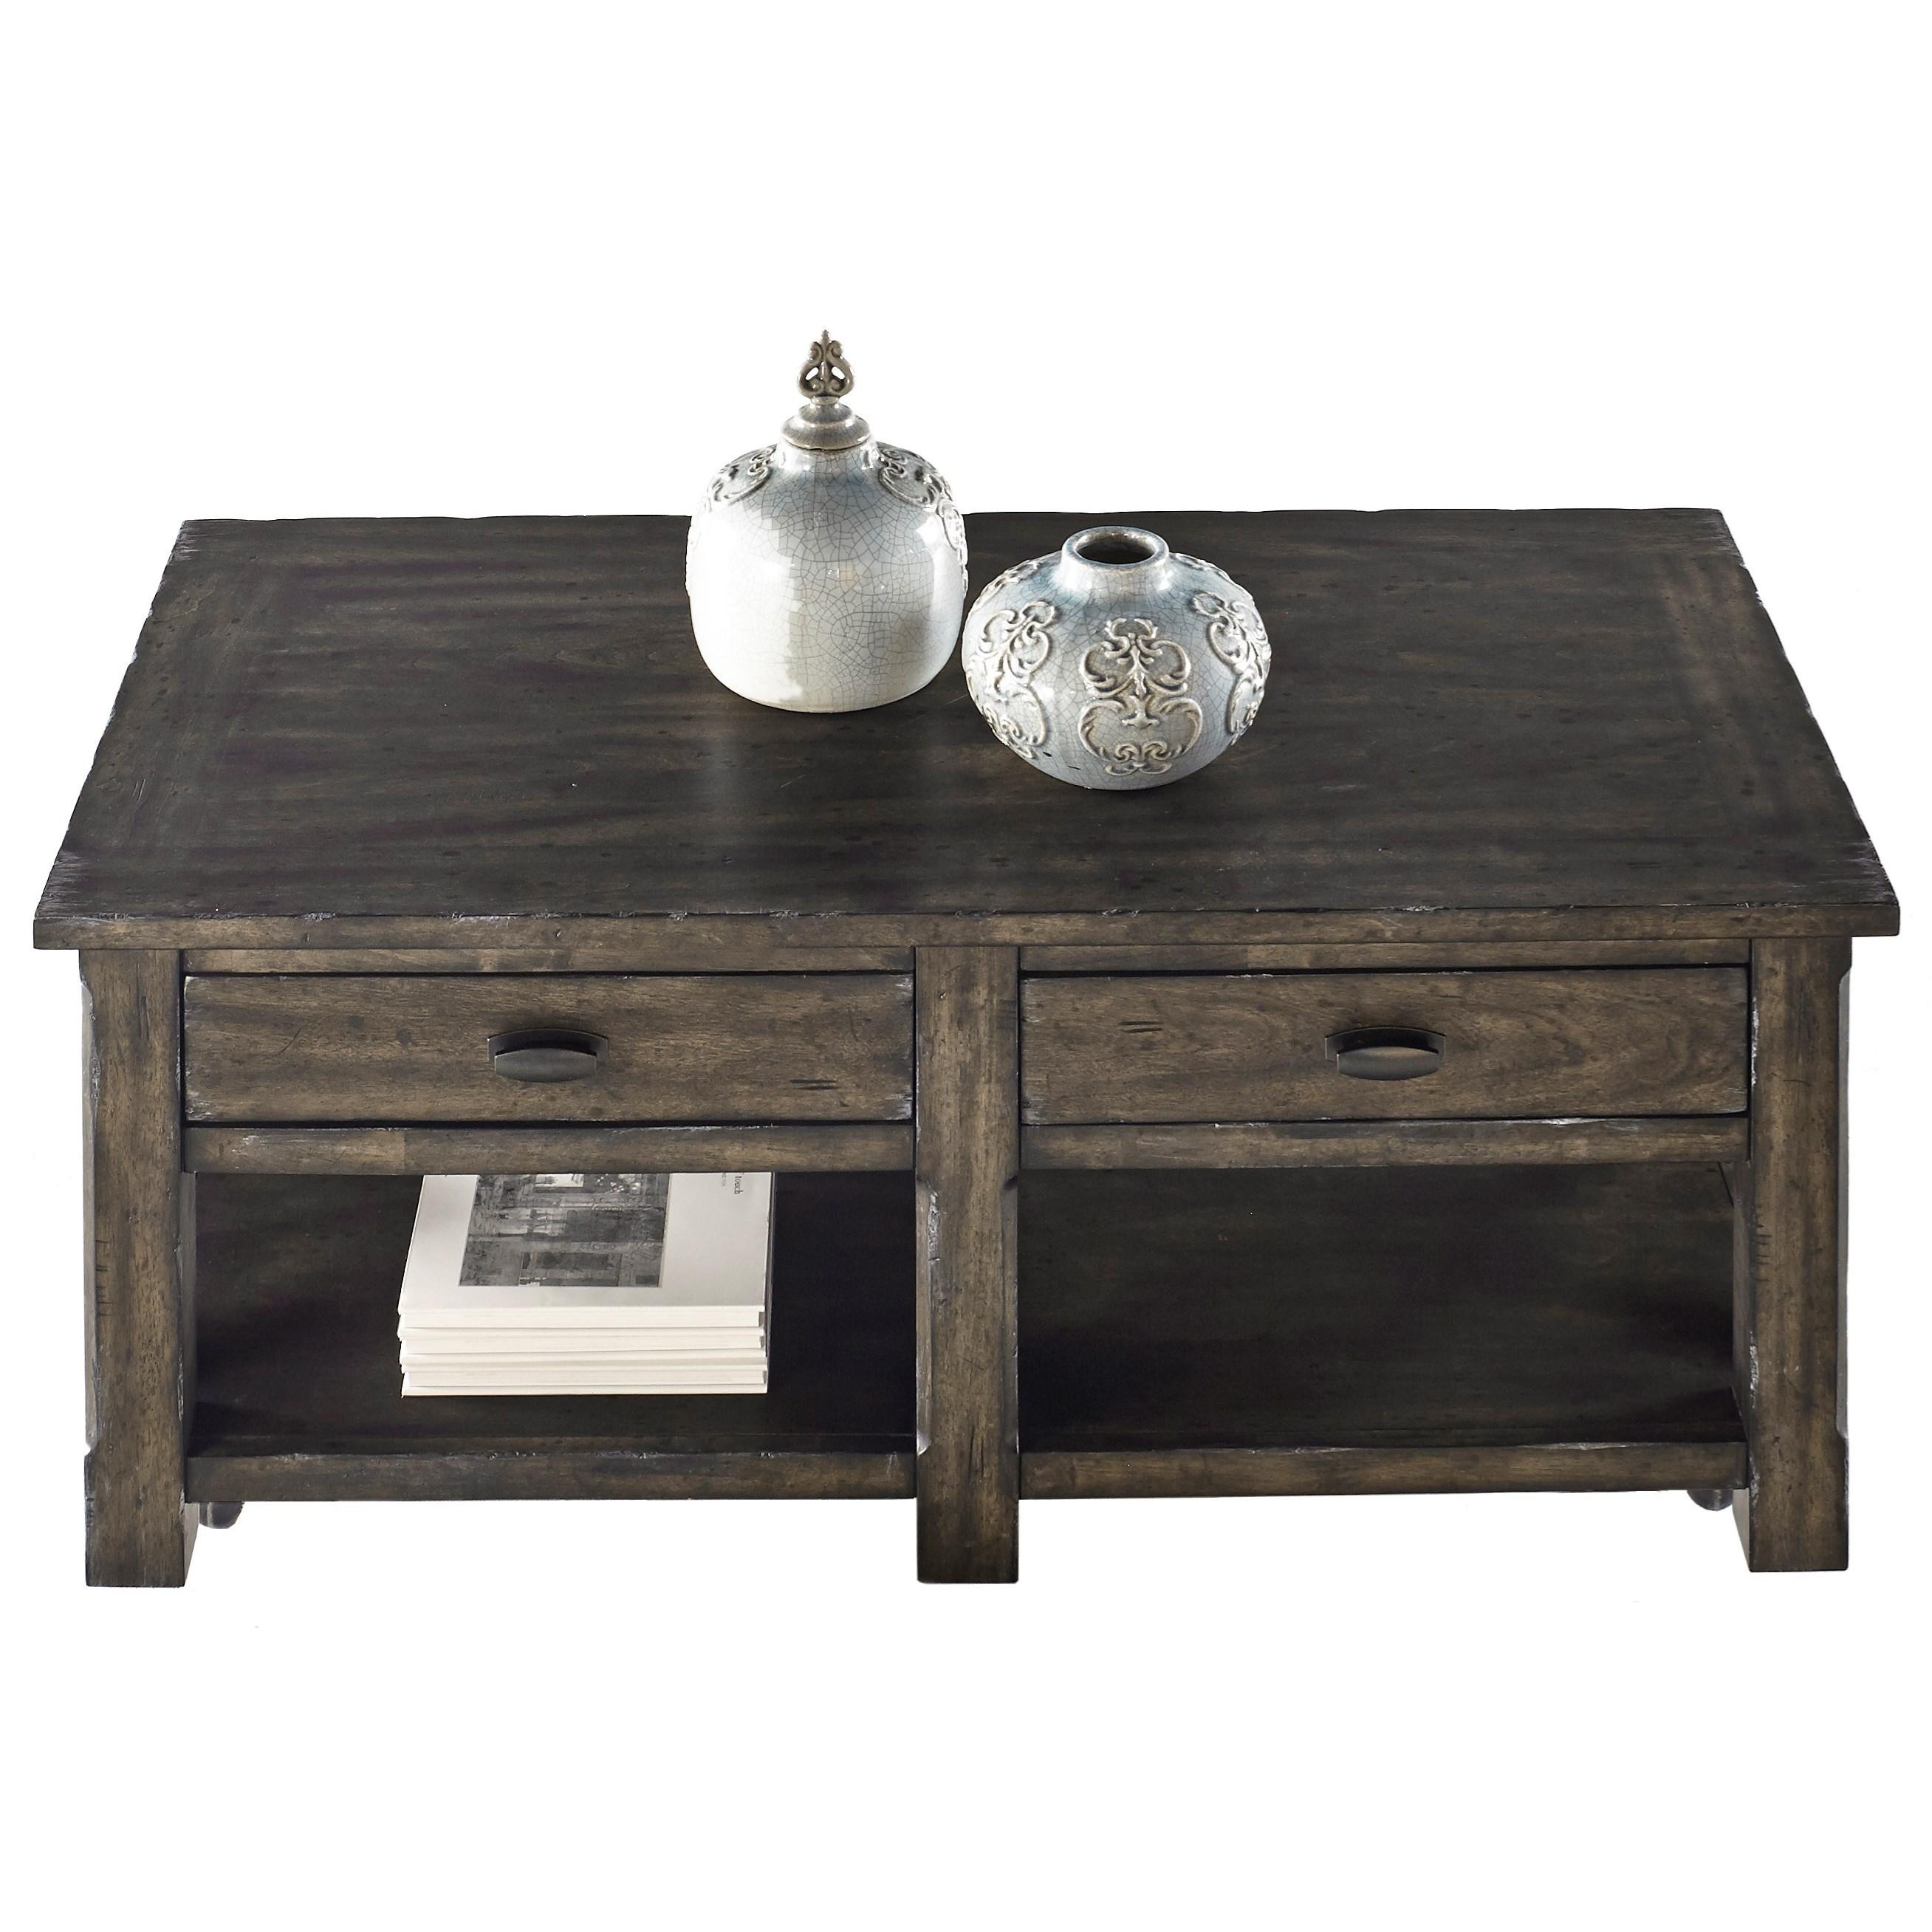 Progressive Furniture Crossroads Rectangular Cocktail Table - Item Number: T550-01